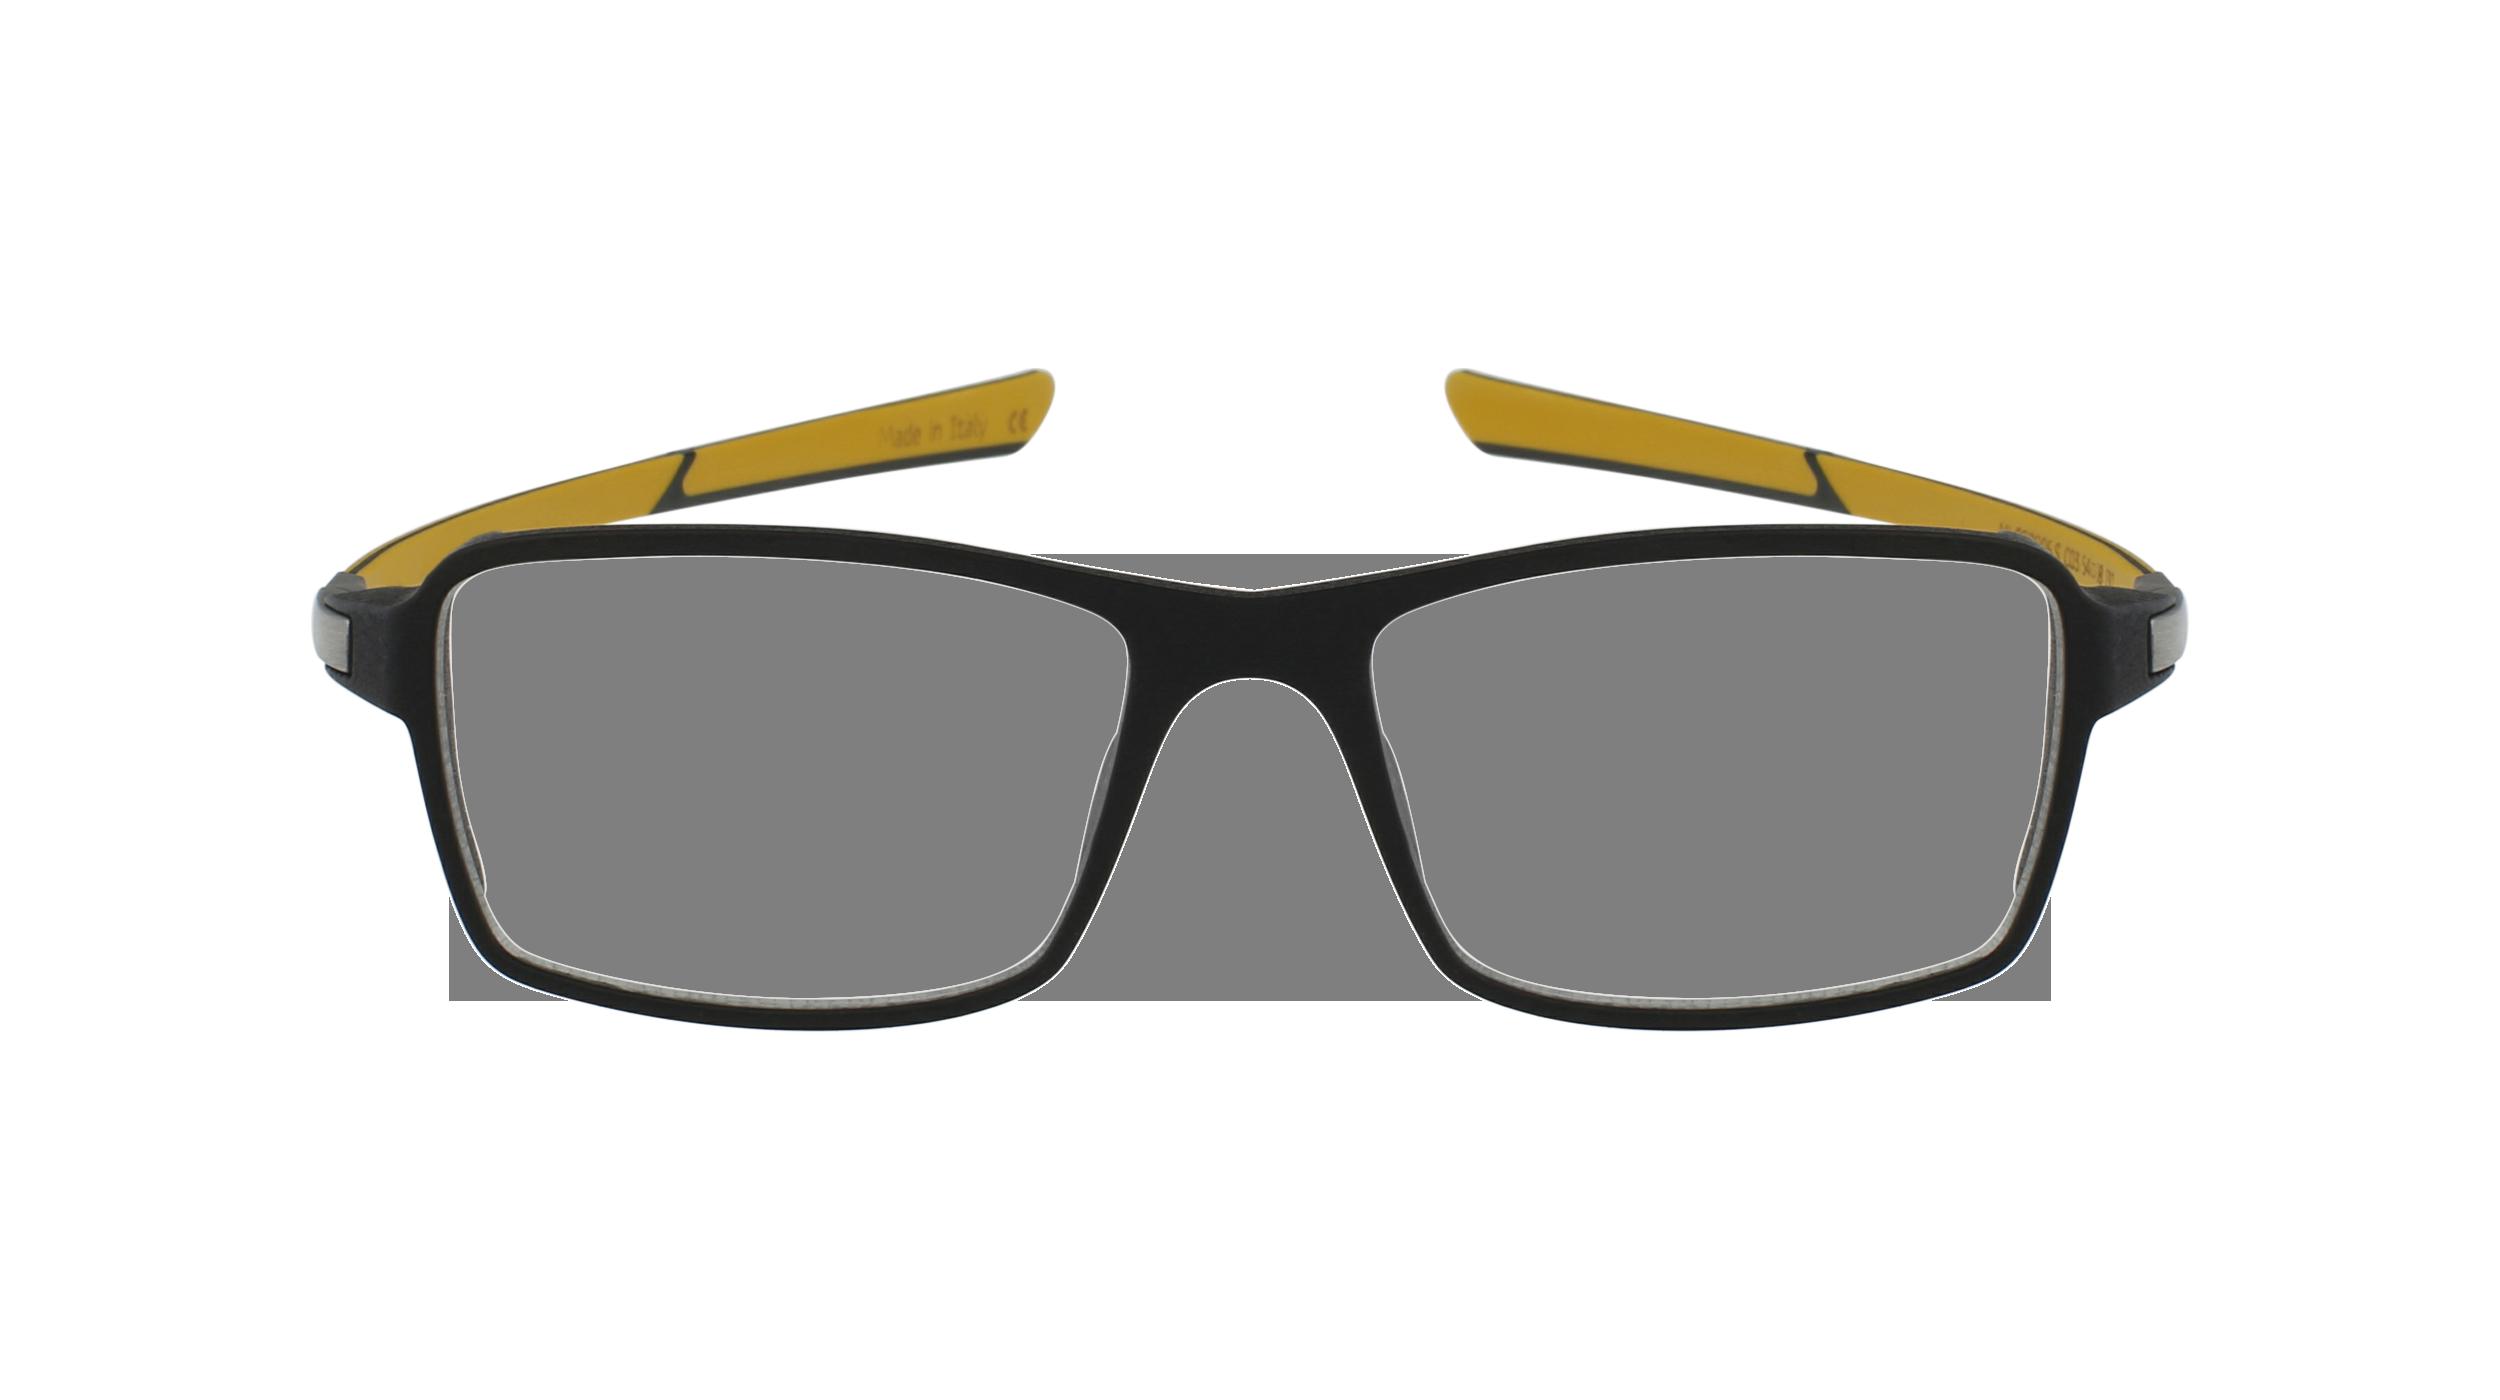 Style Name: MLSGPO06.C3S.54